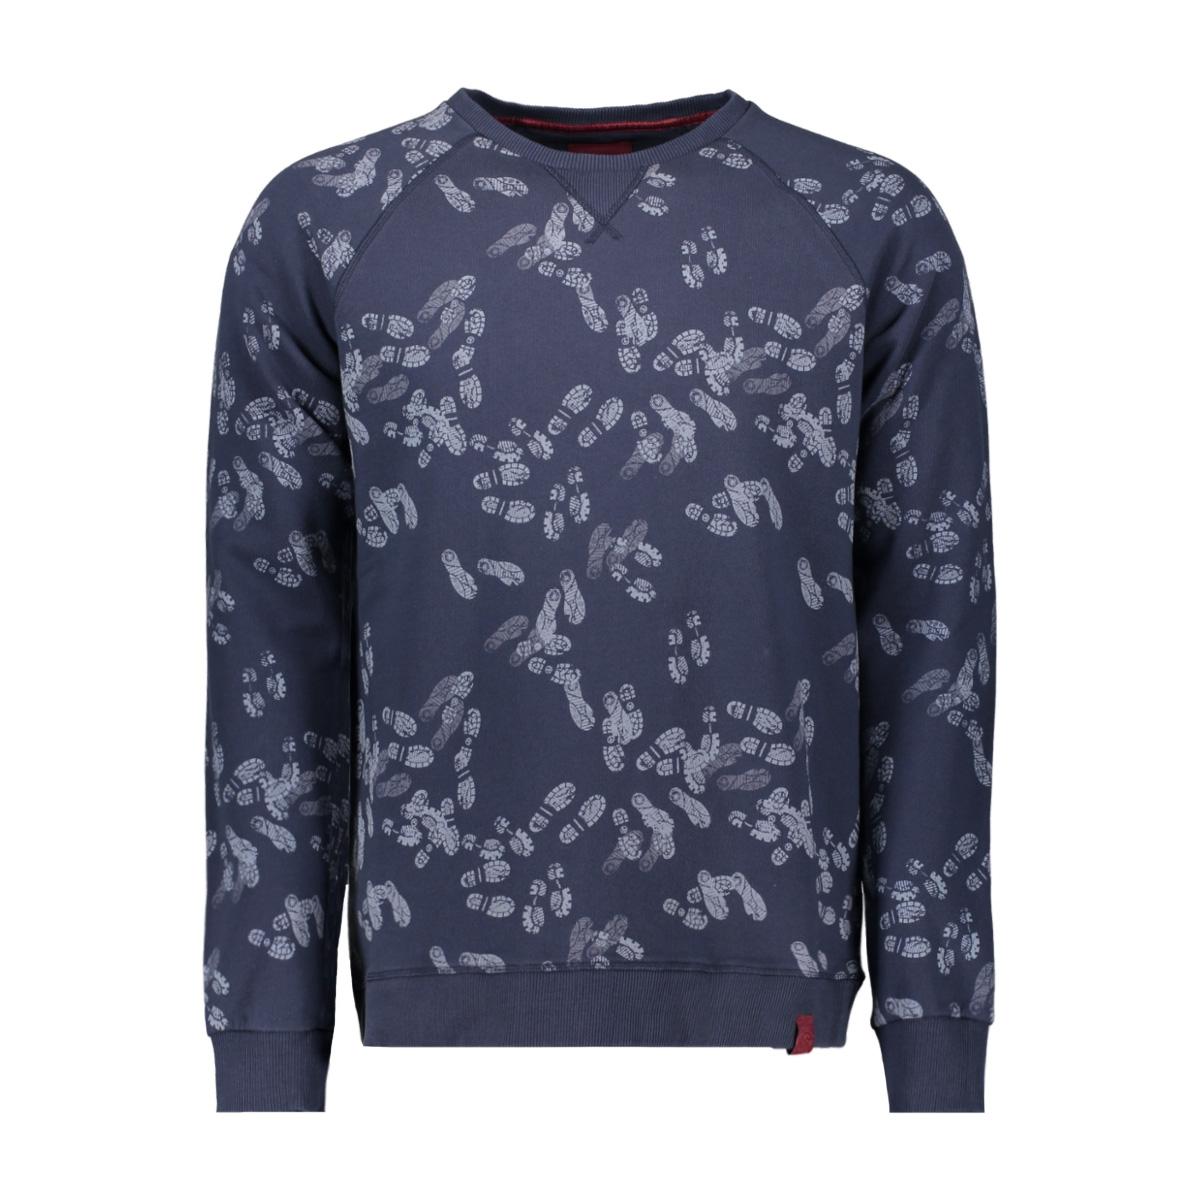 swt001 companeros sweater 02navy